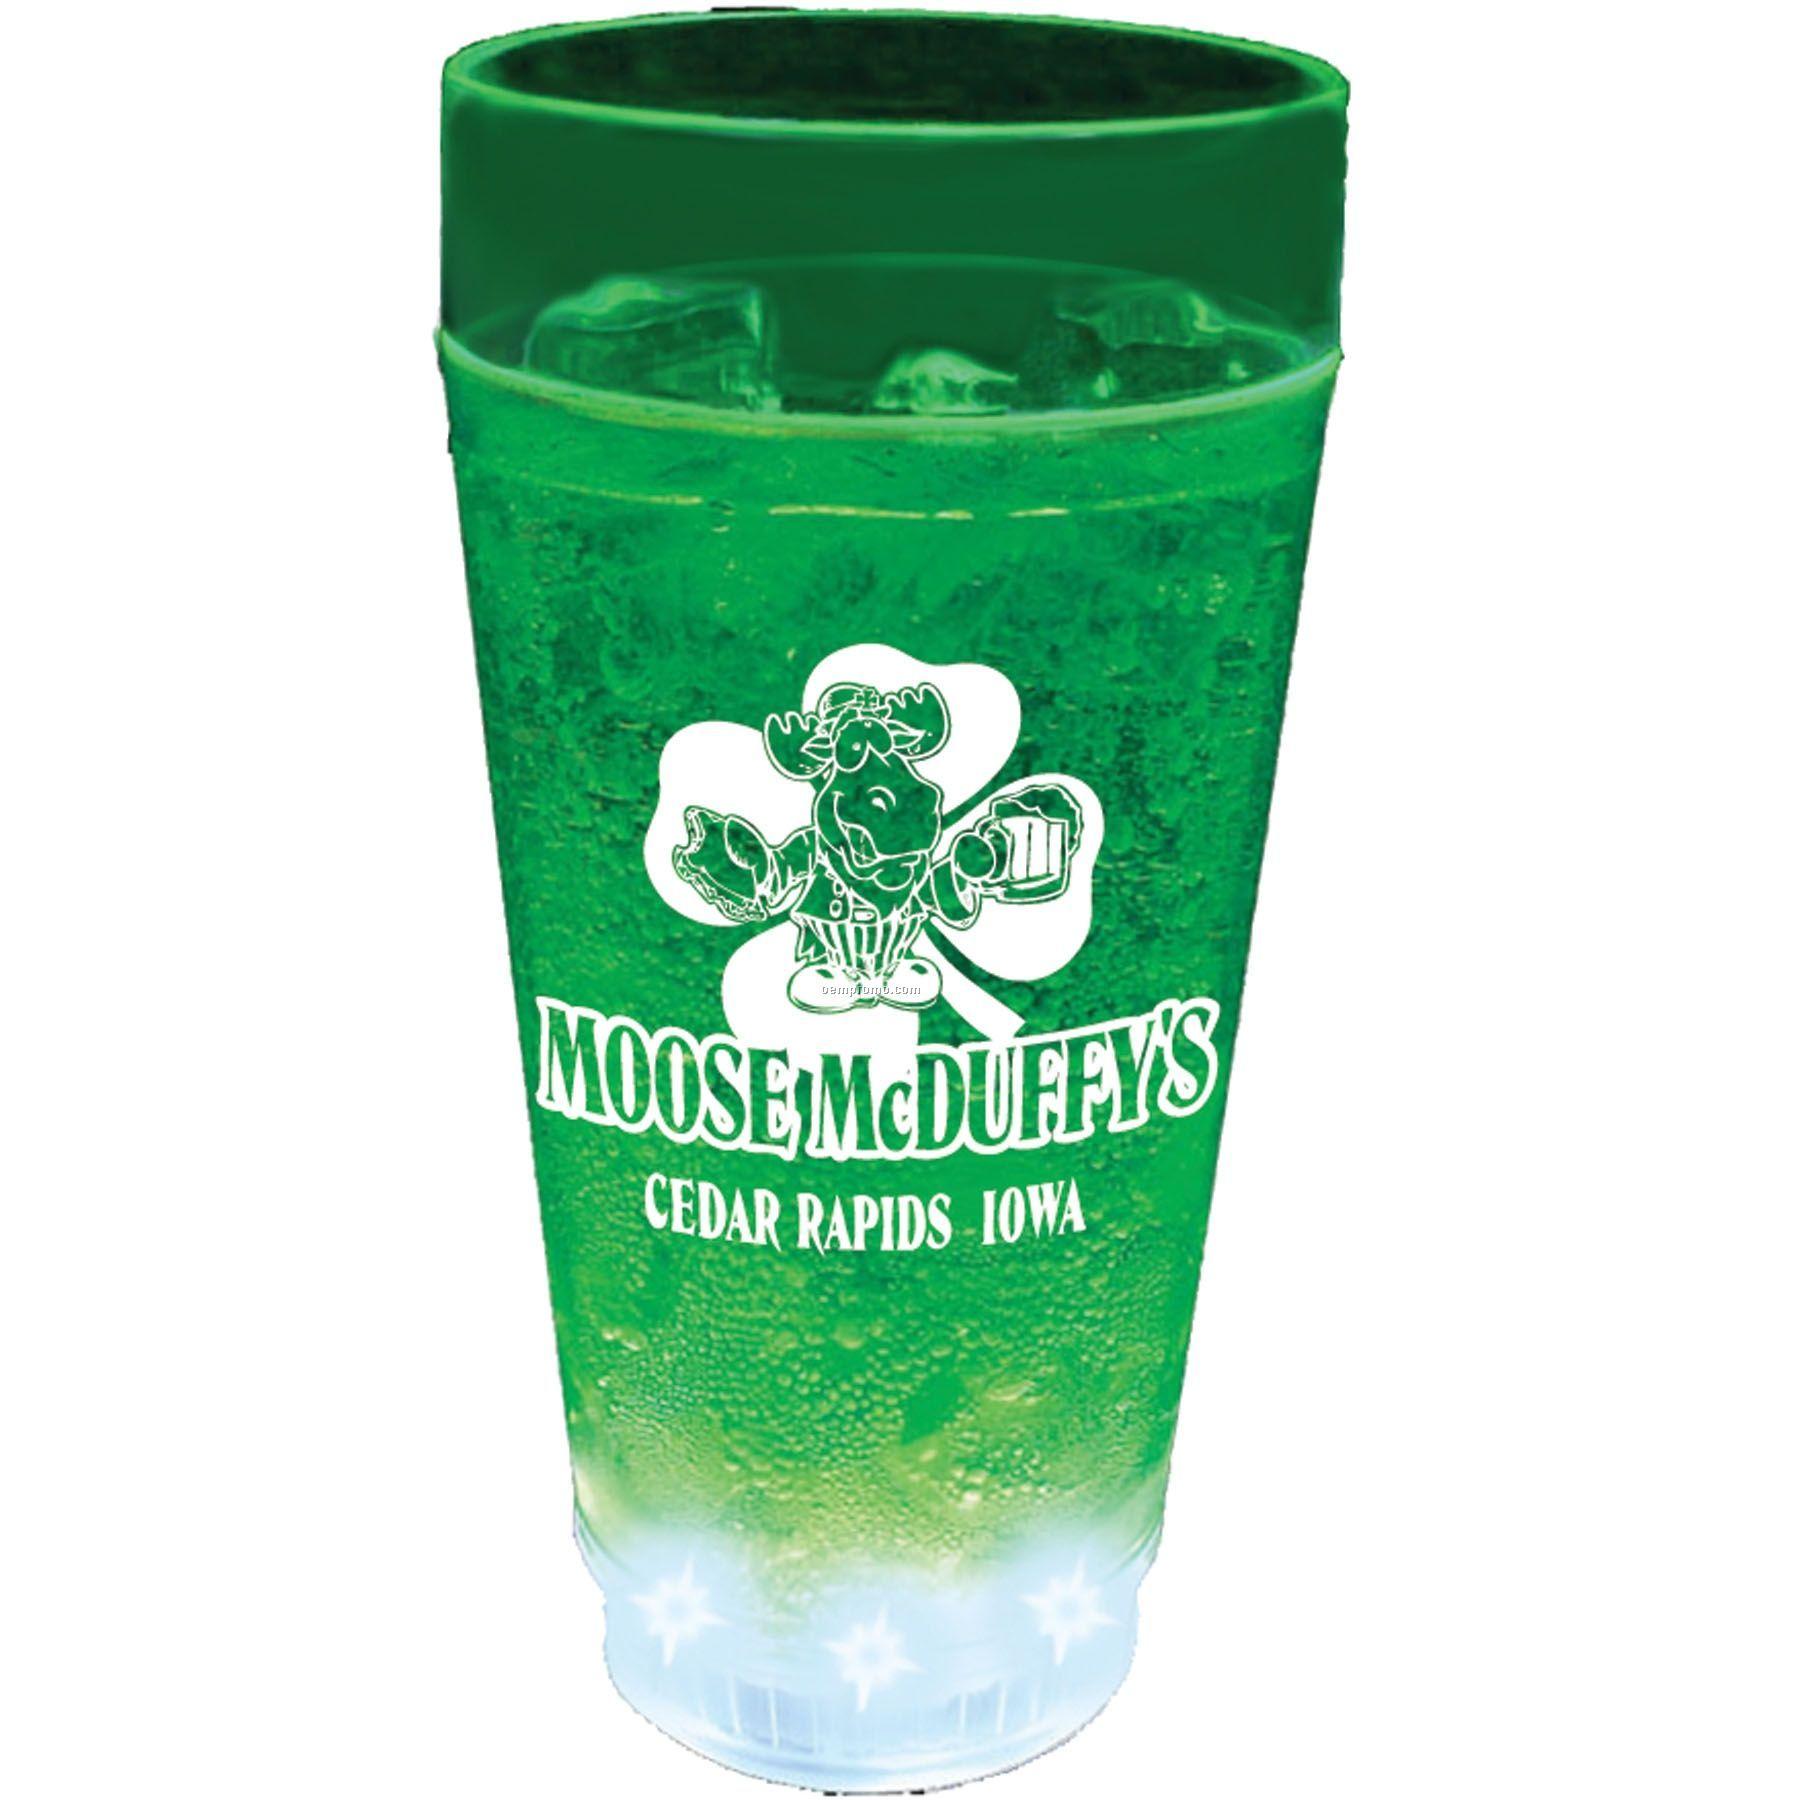 20 Oz. 5-light Cup